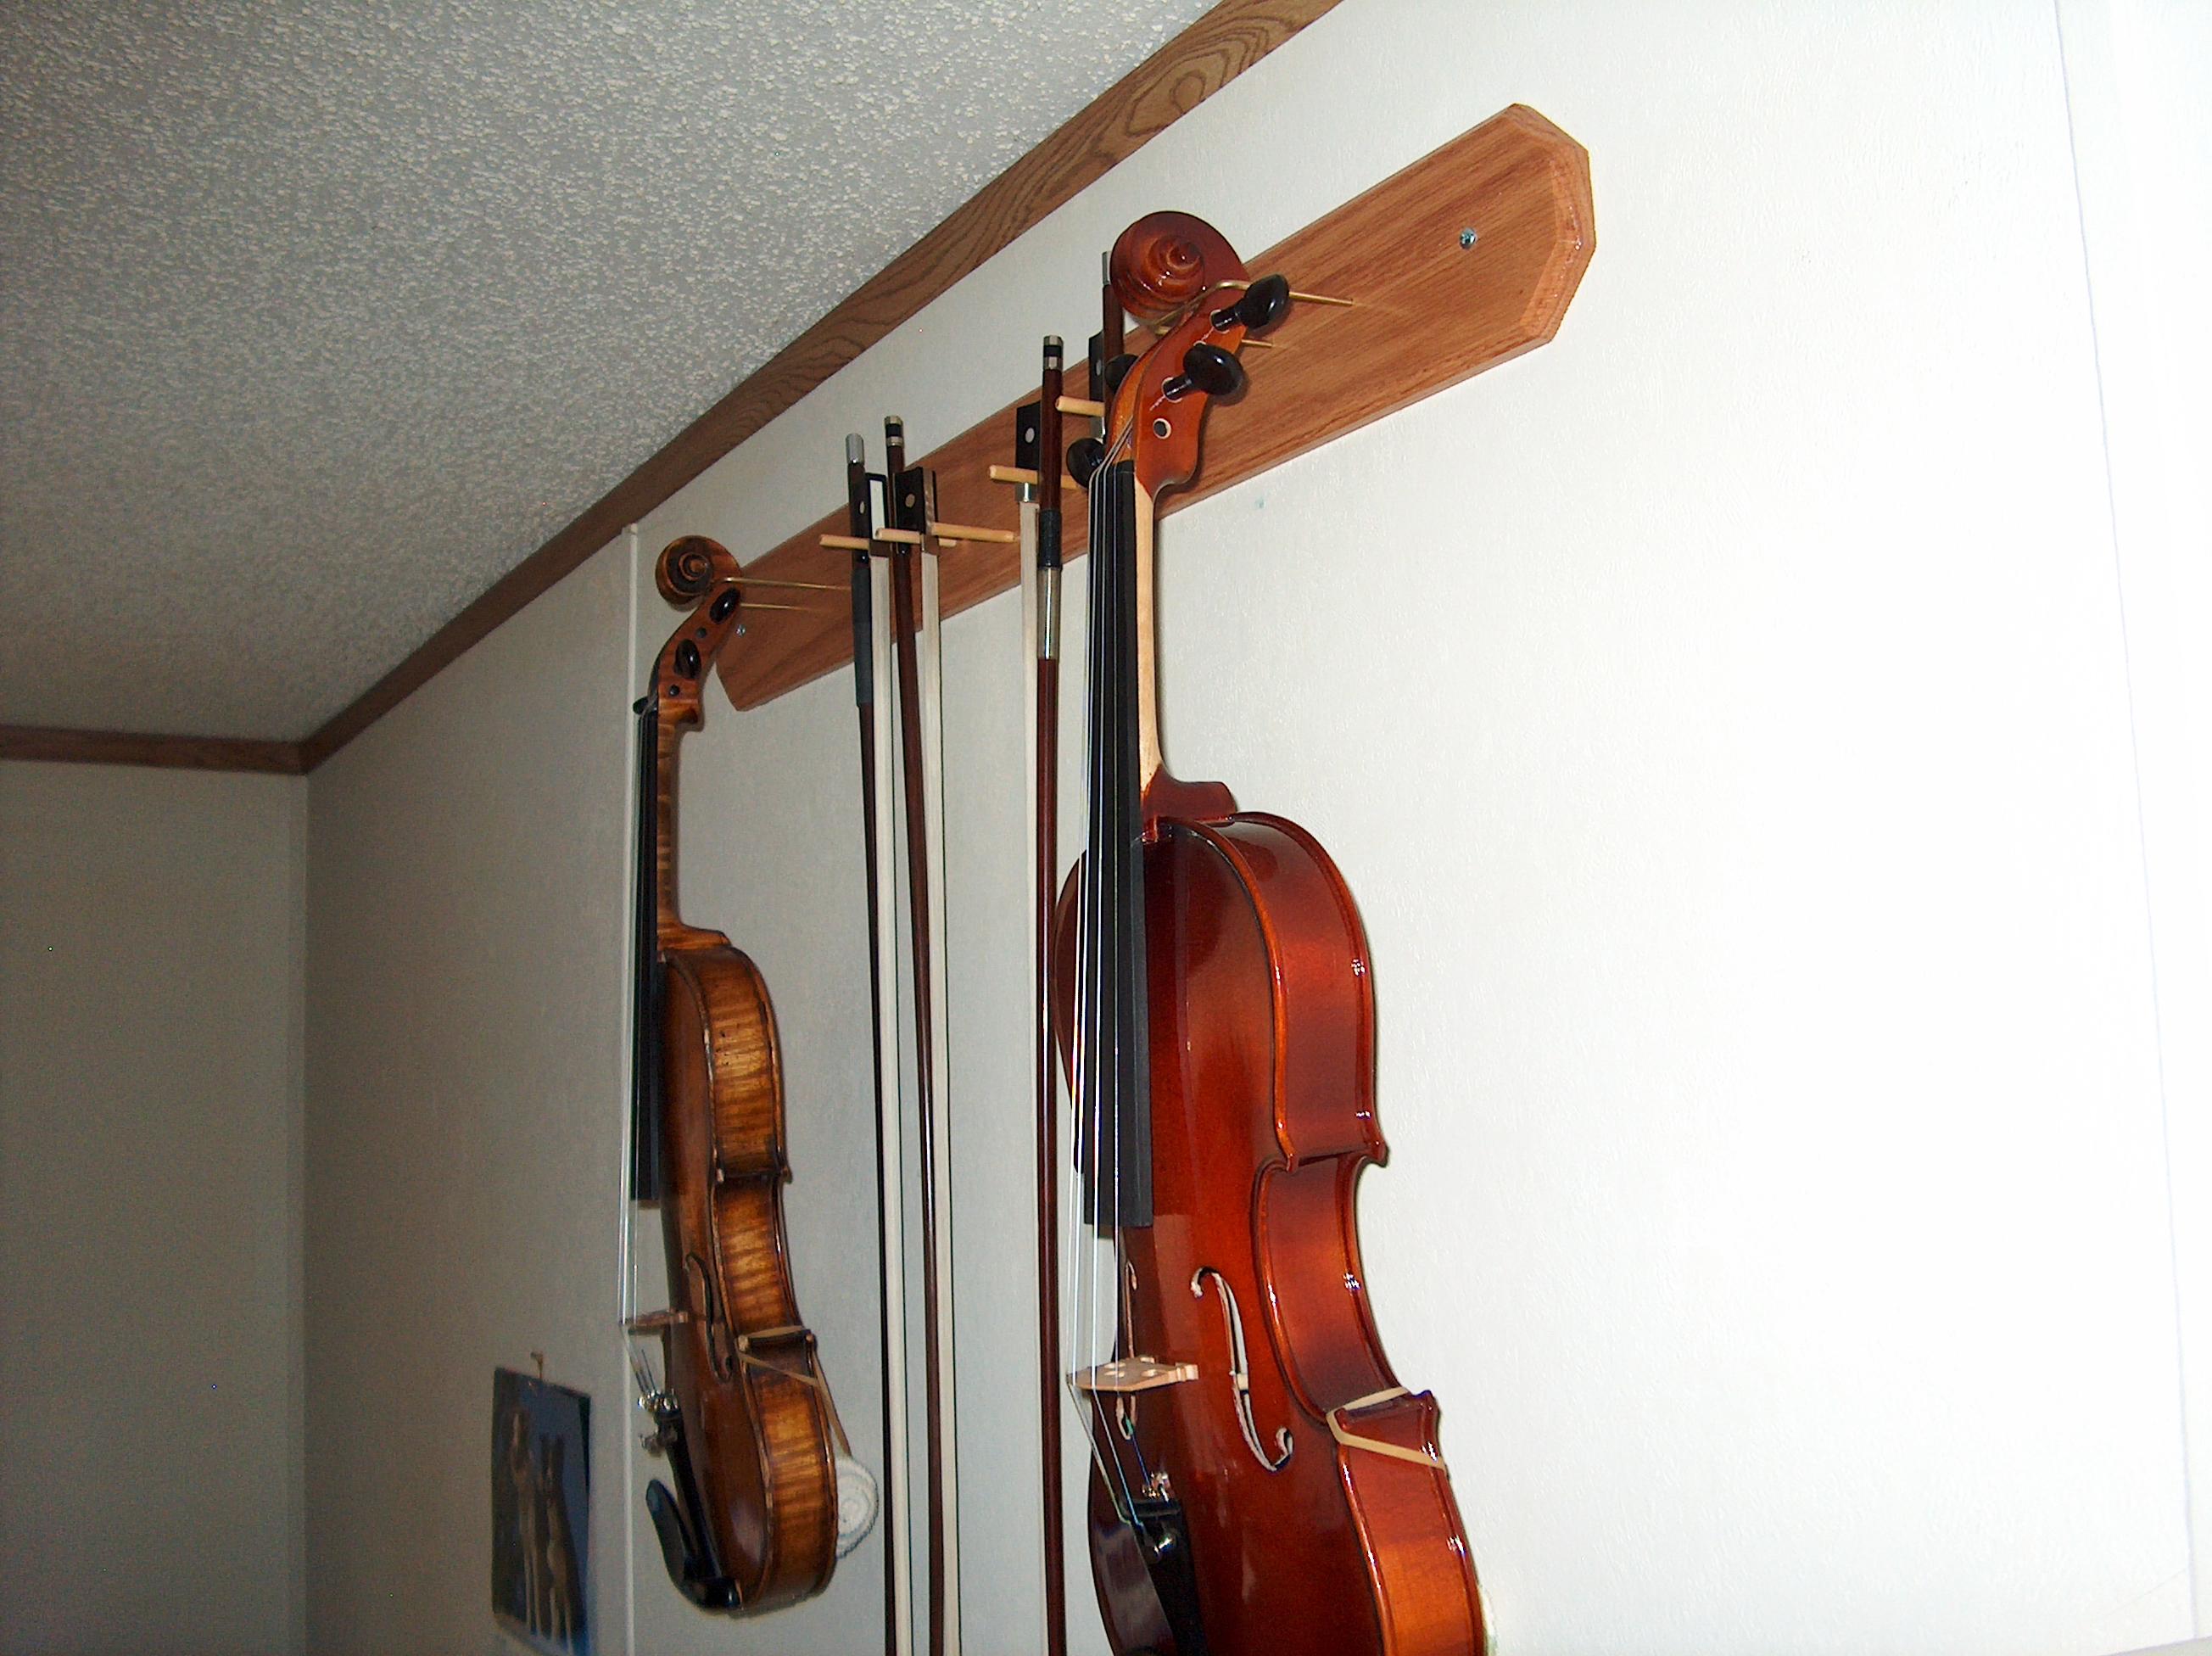 Fiddle talk - VIOLIN DISCUSSION FORUM